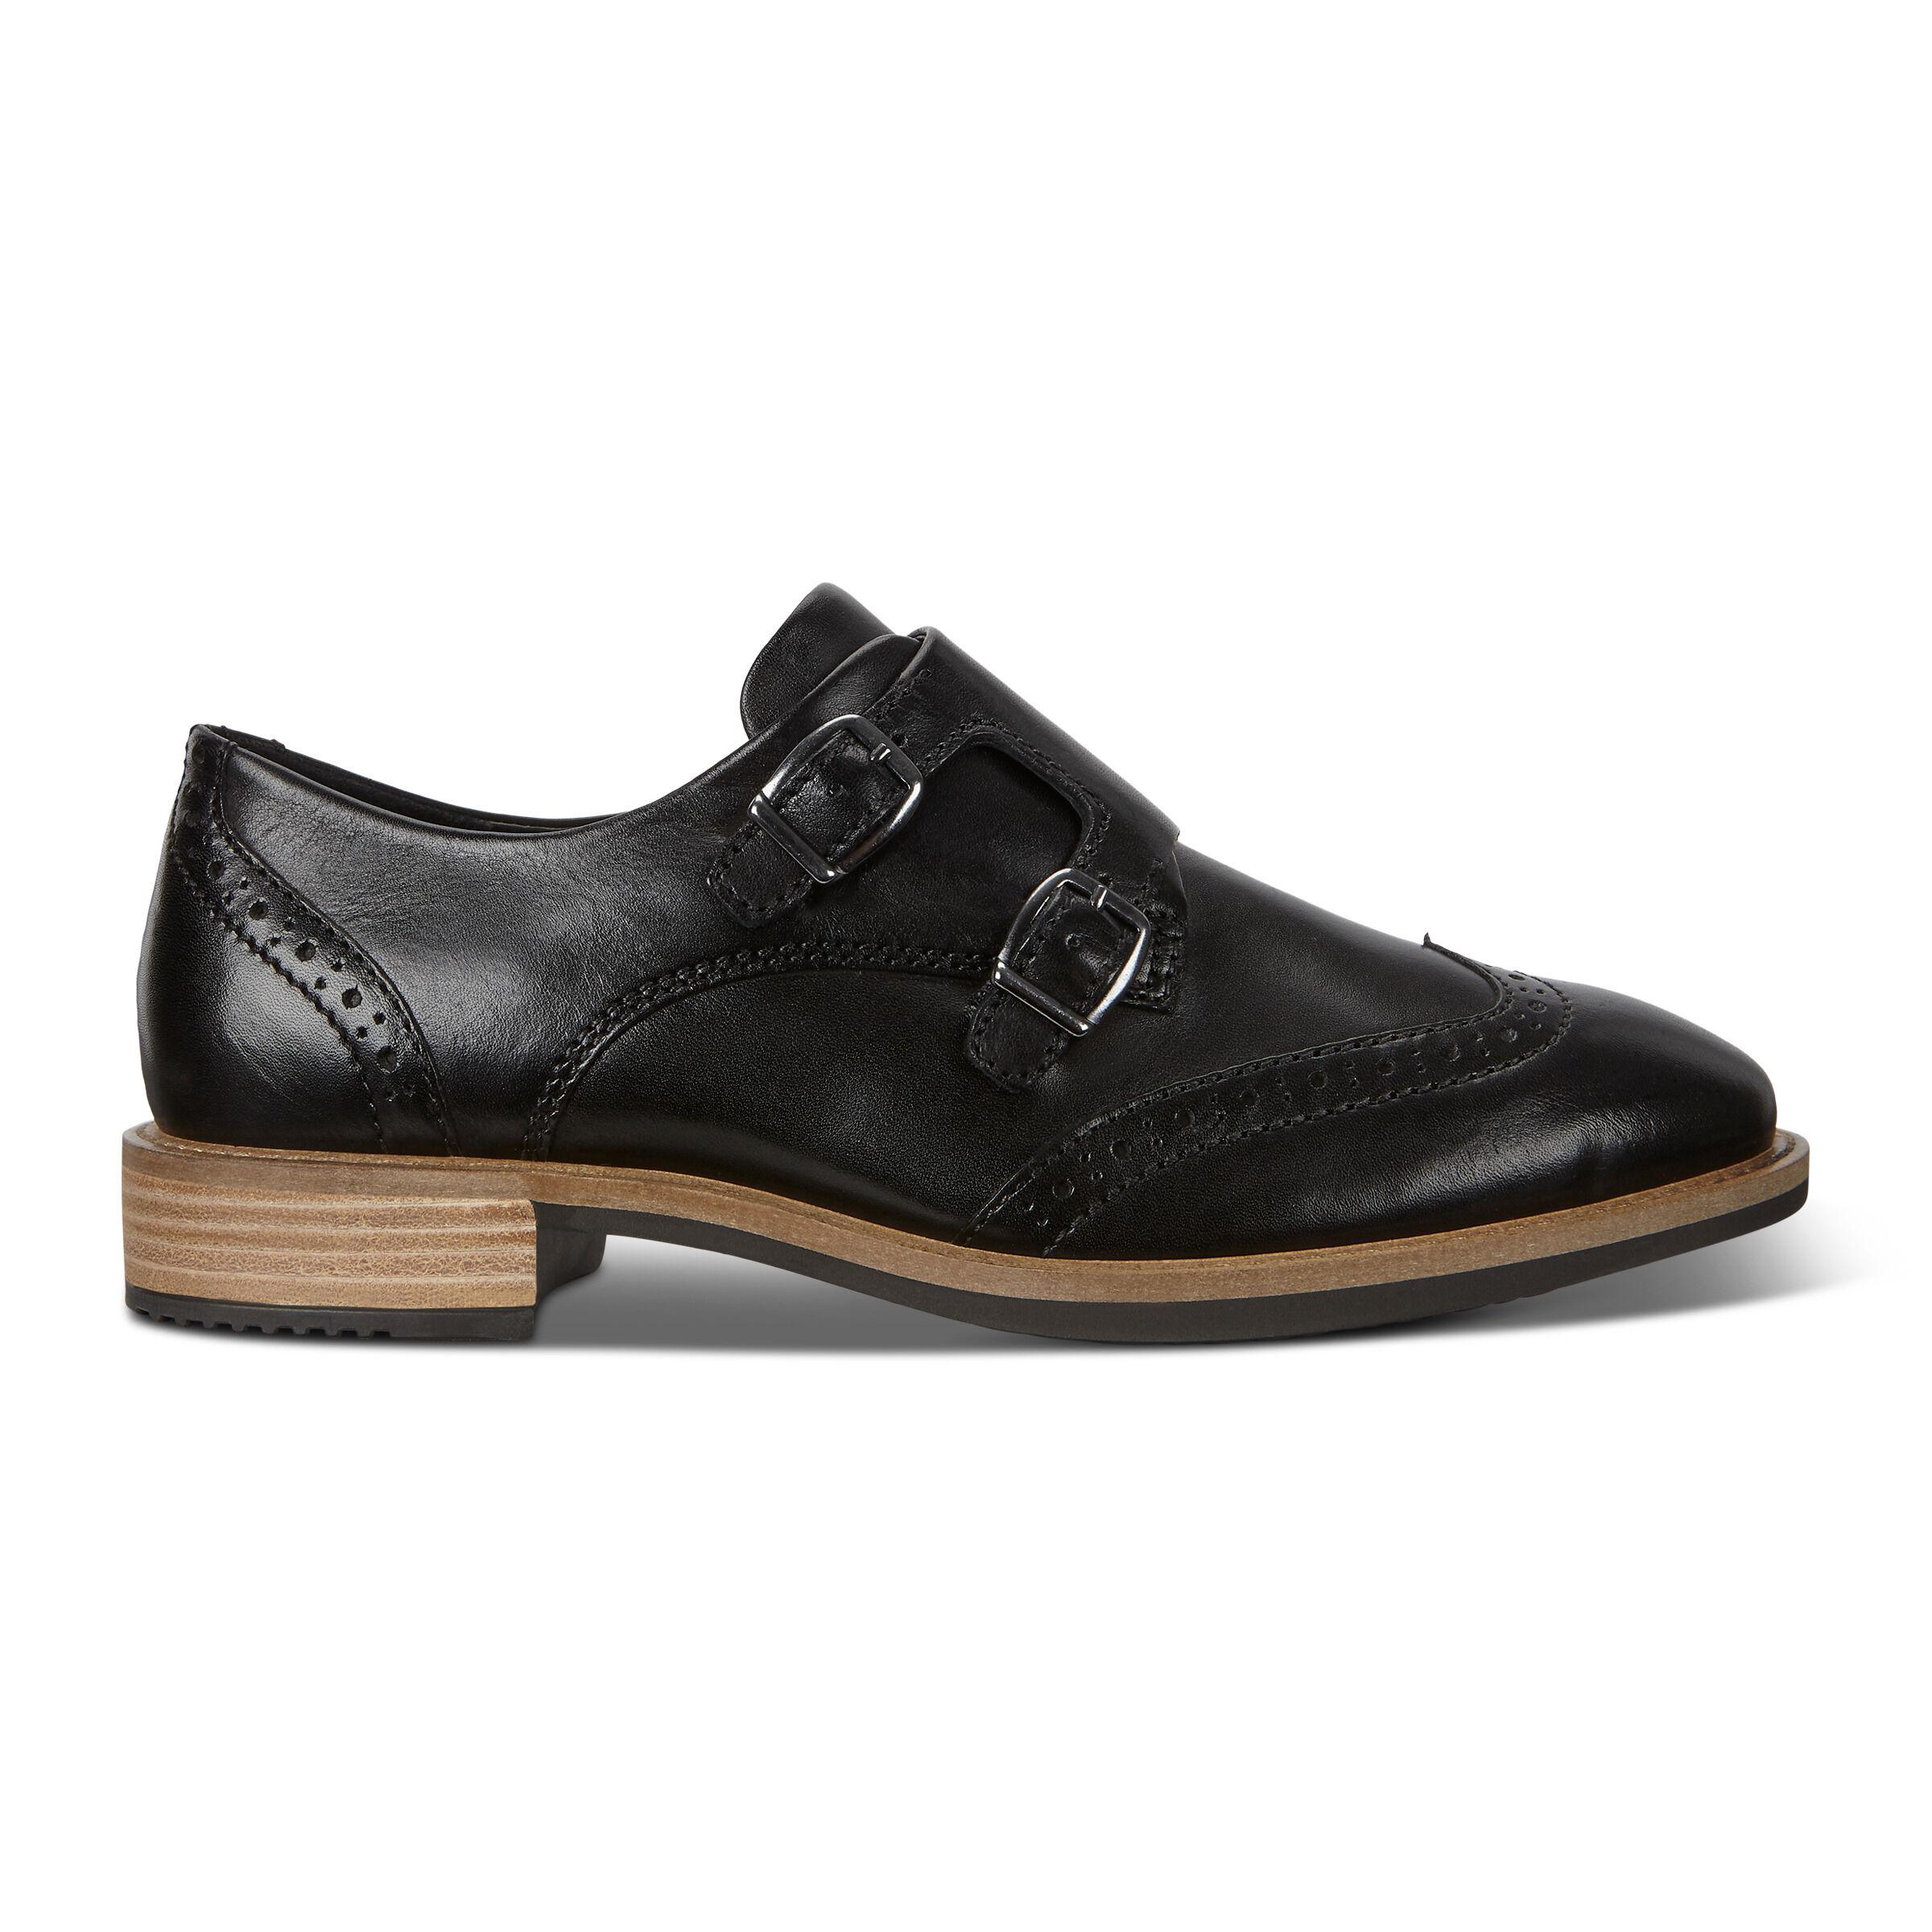 ECCO Sartorelle 25 Tailored Womens Shoe